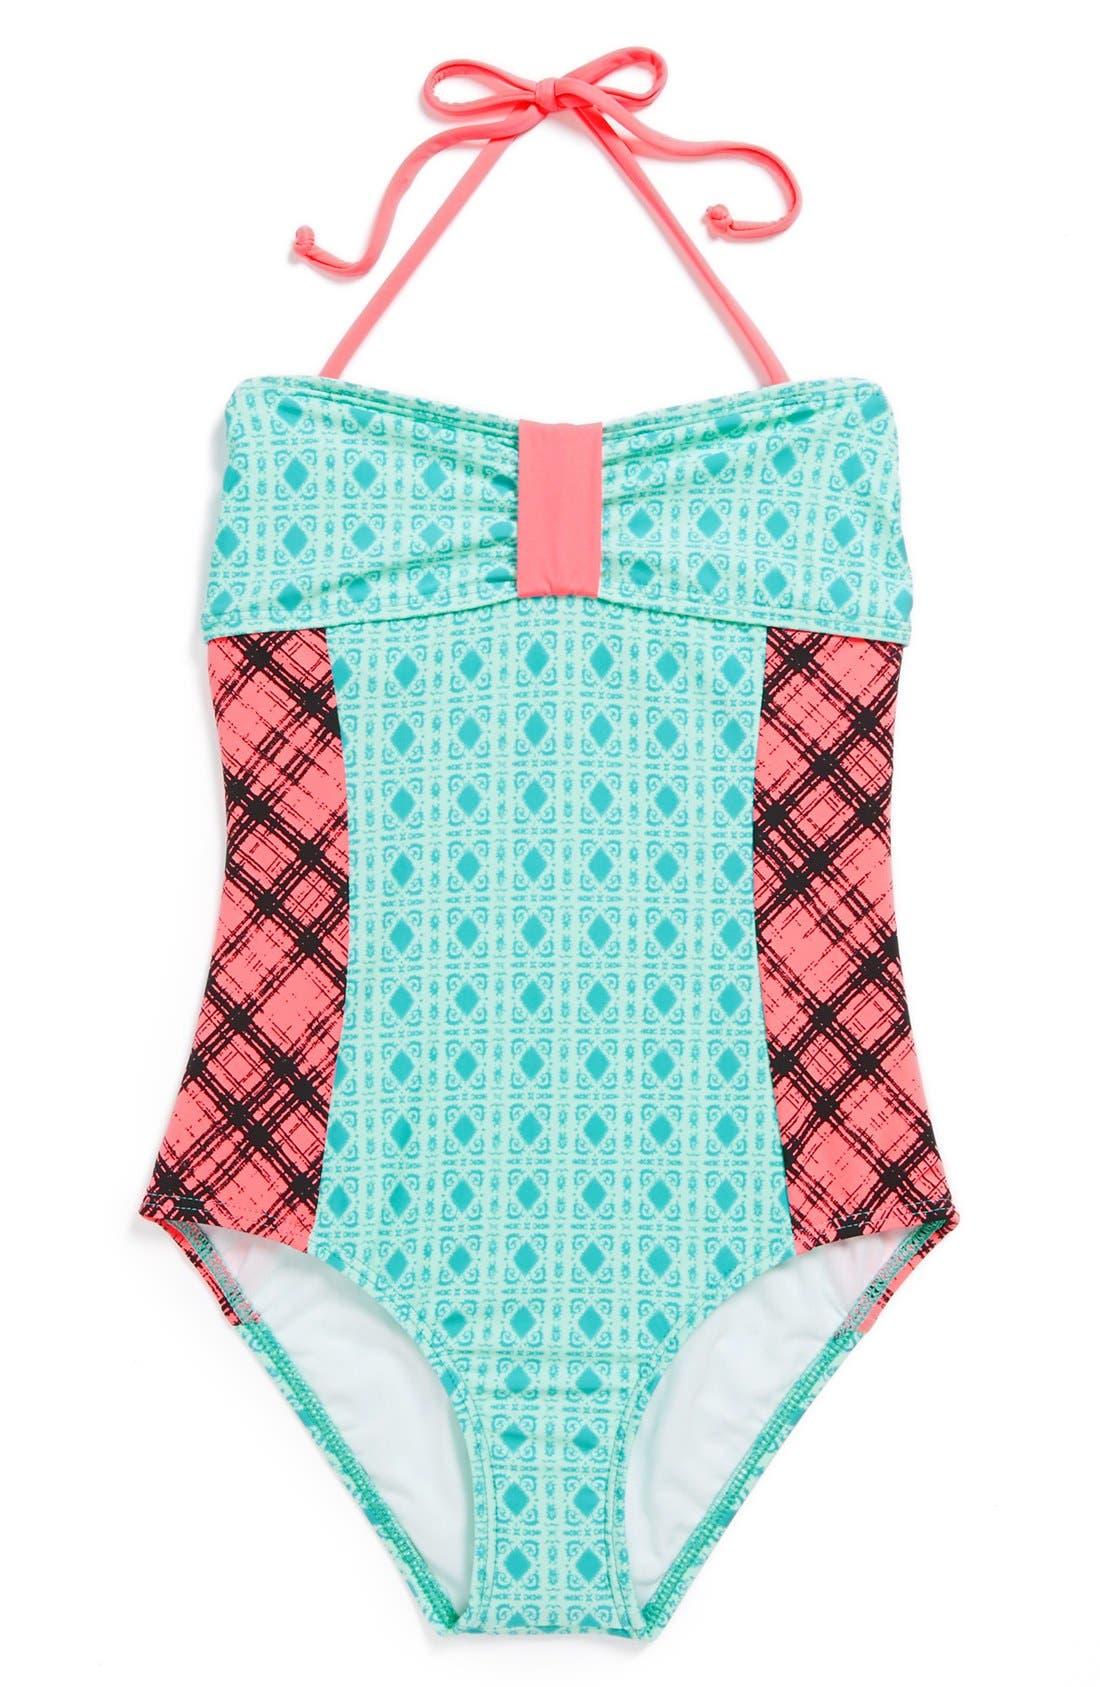 Main Image - Ella Moss Mixed Print One-Piece Swimsuit (Big Girls)